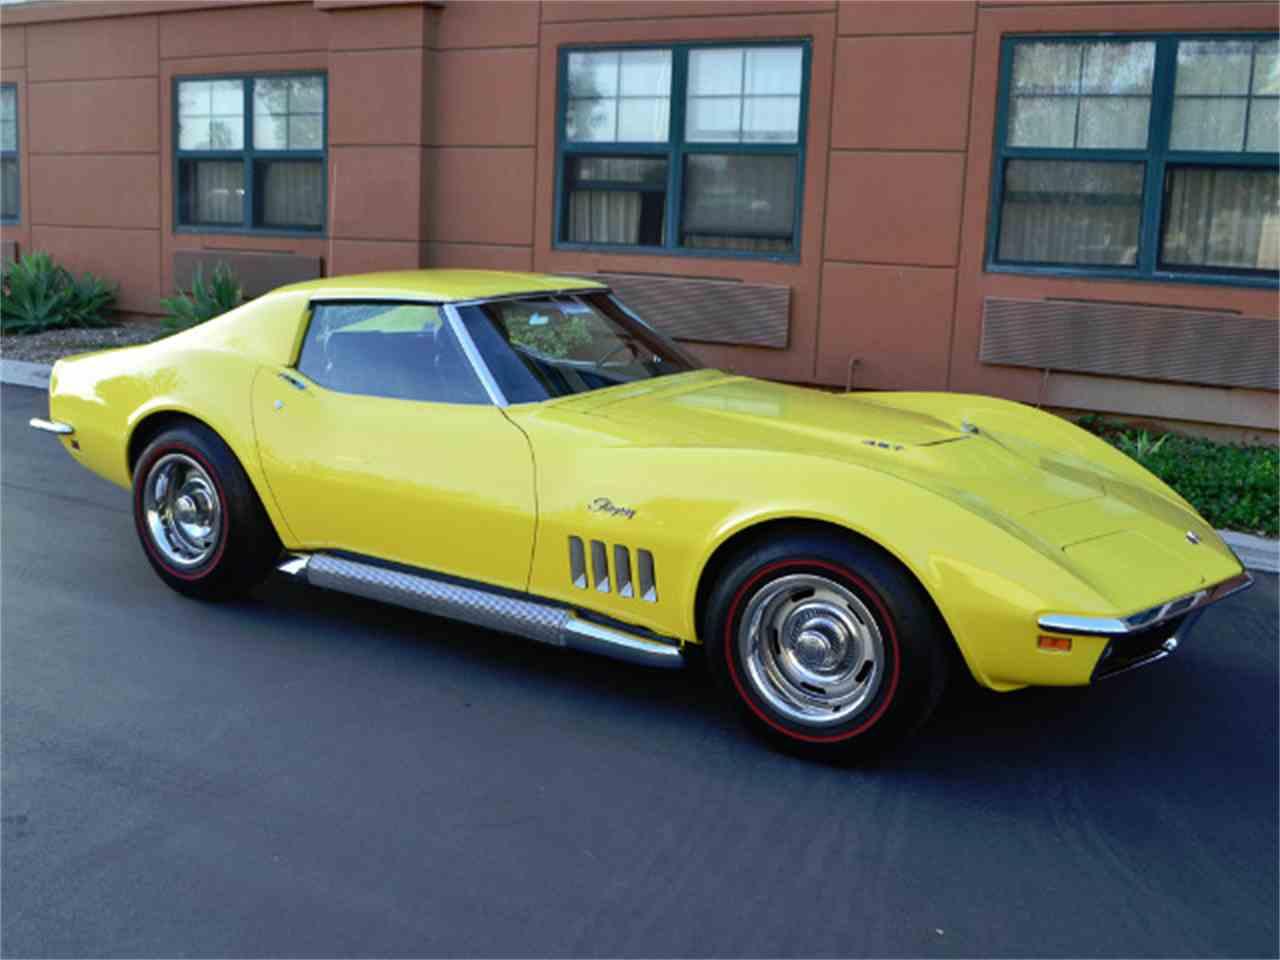 1969 Chevrolet Corvette L88 Convertible 189253 The 427 Bigblock 69 Wiper Motor Wiring Diagram For Sale Classiccarscom Cc971144